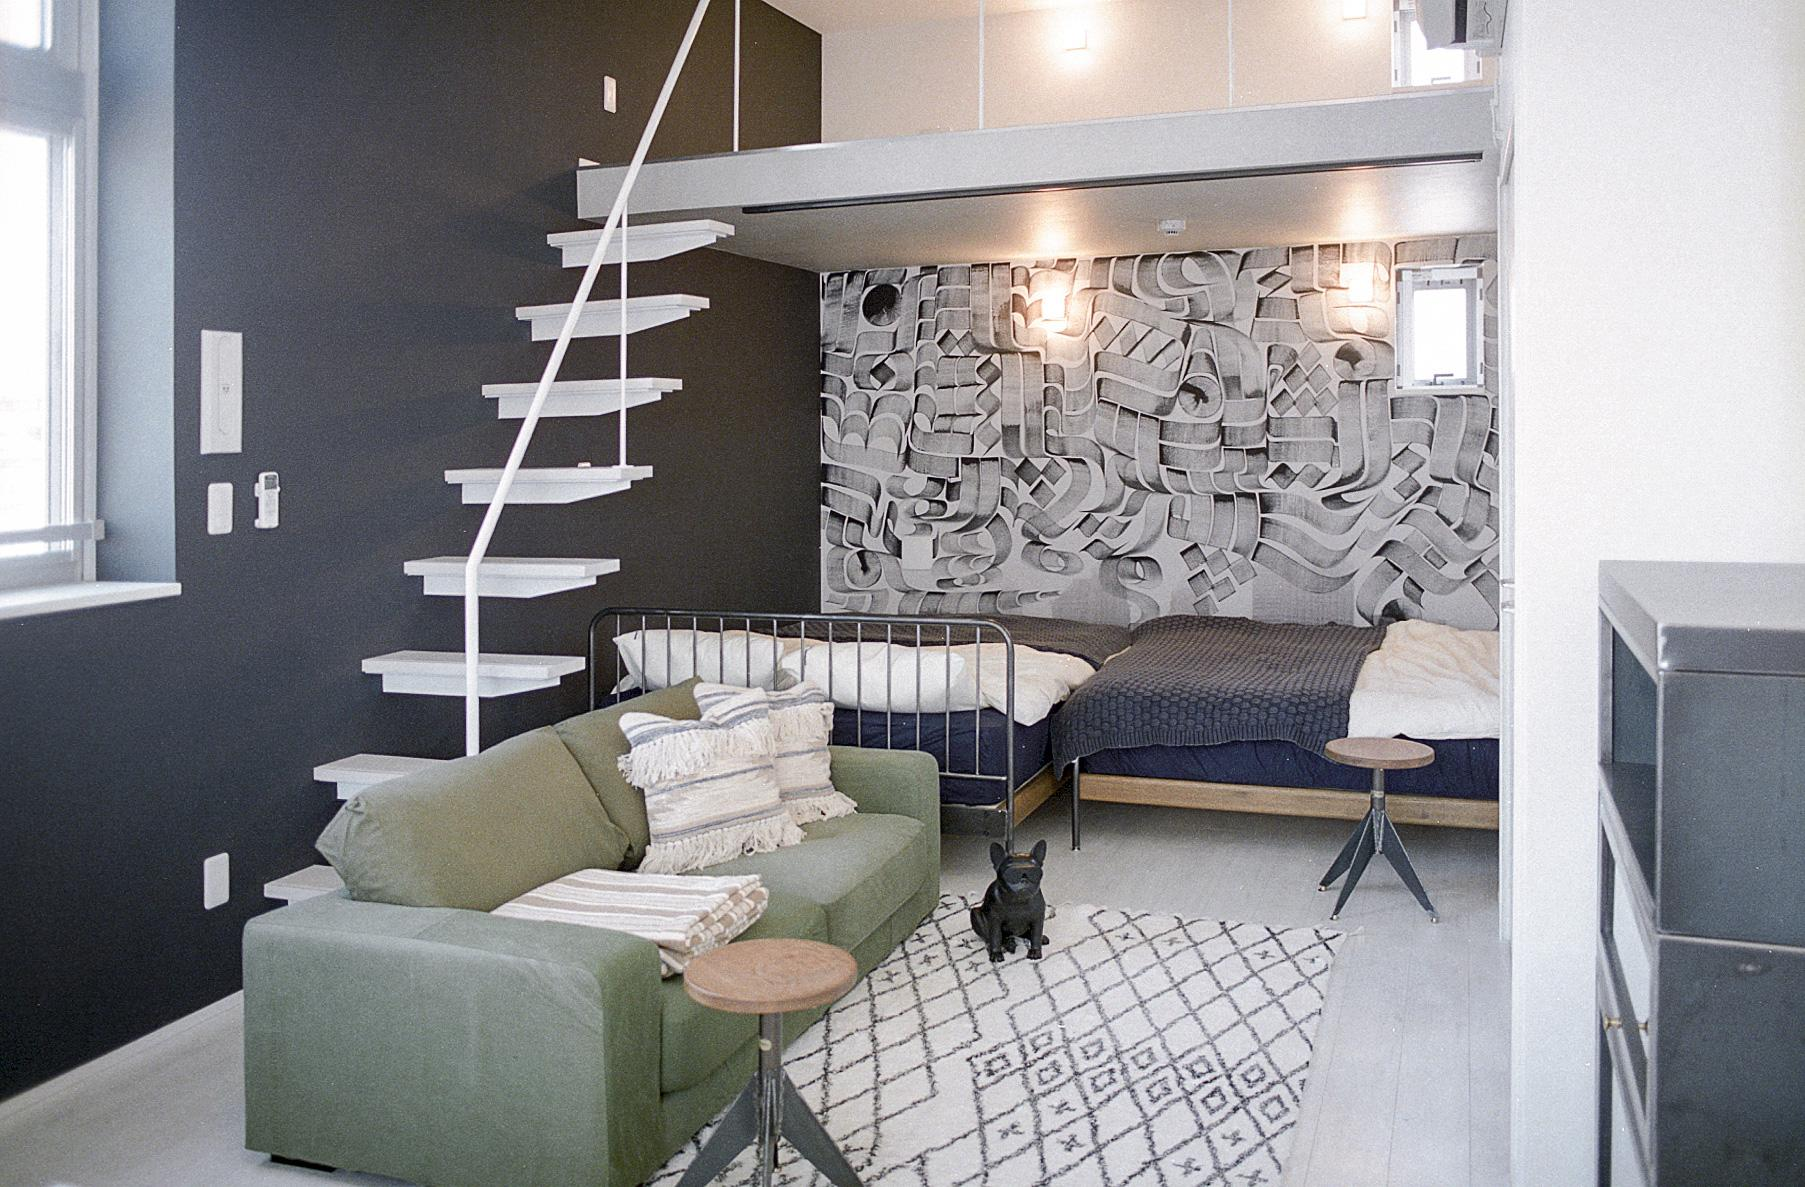 1K Apartment - Kaminoge - Setagaya-ku - Tokyo - Japan ...